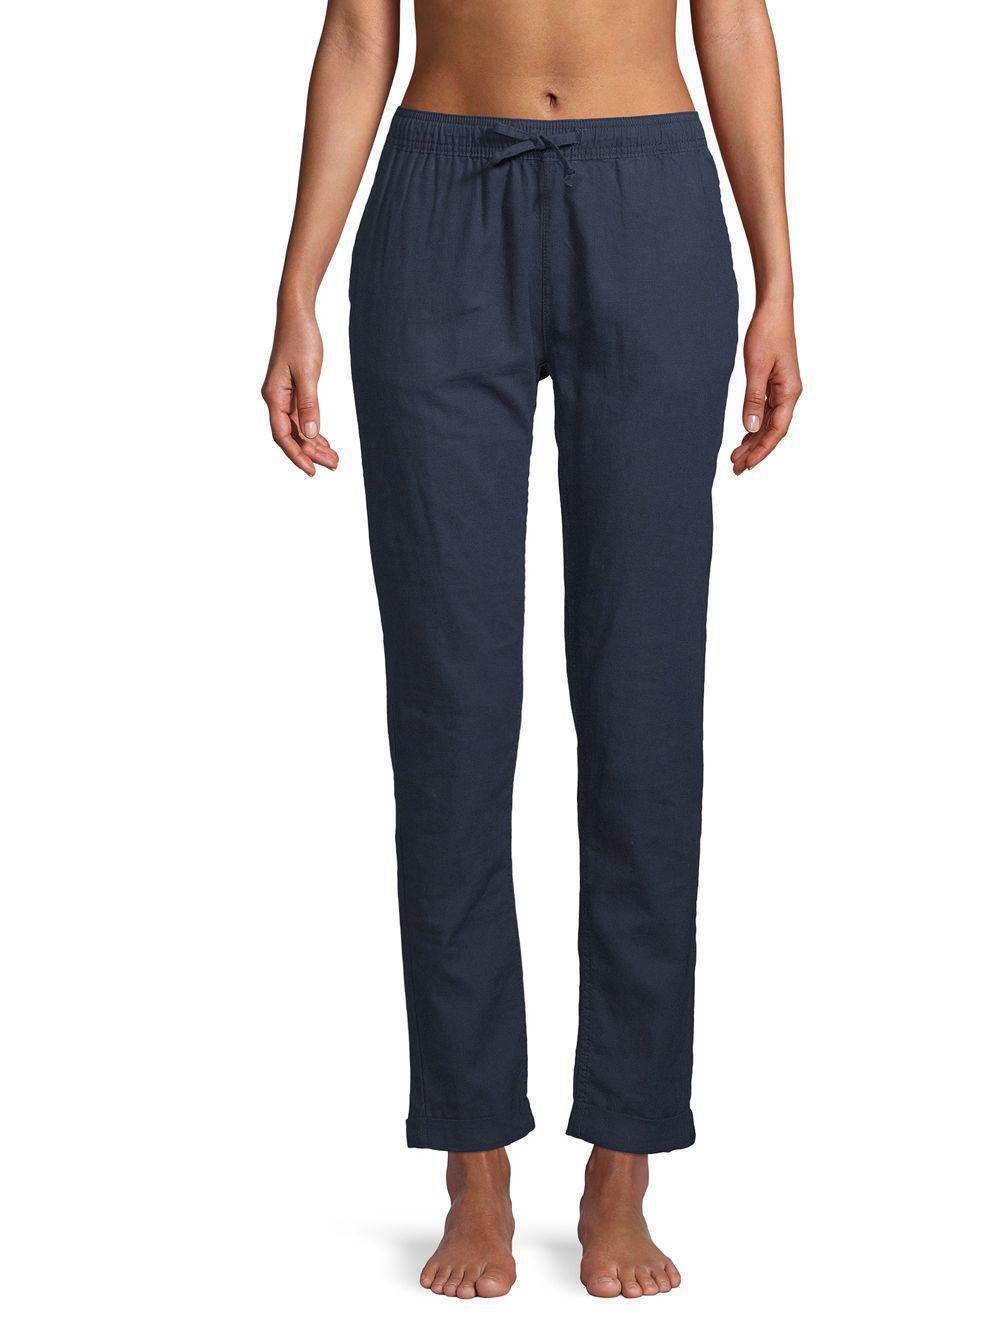 NEW NWT  150  Onia Ella Linen Cotton Coverup Pants Navy Blau Größe Medium m